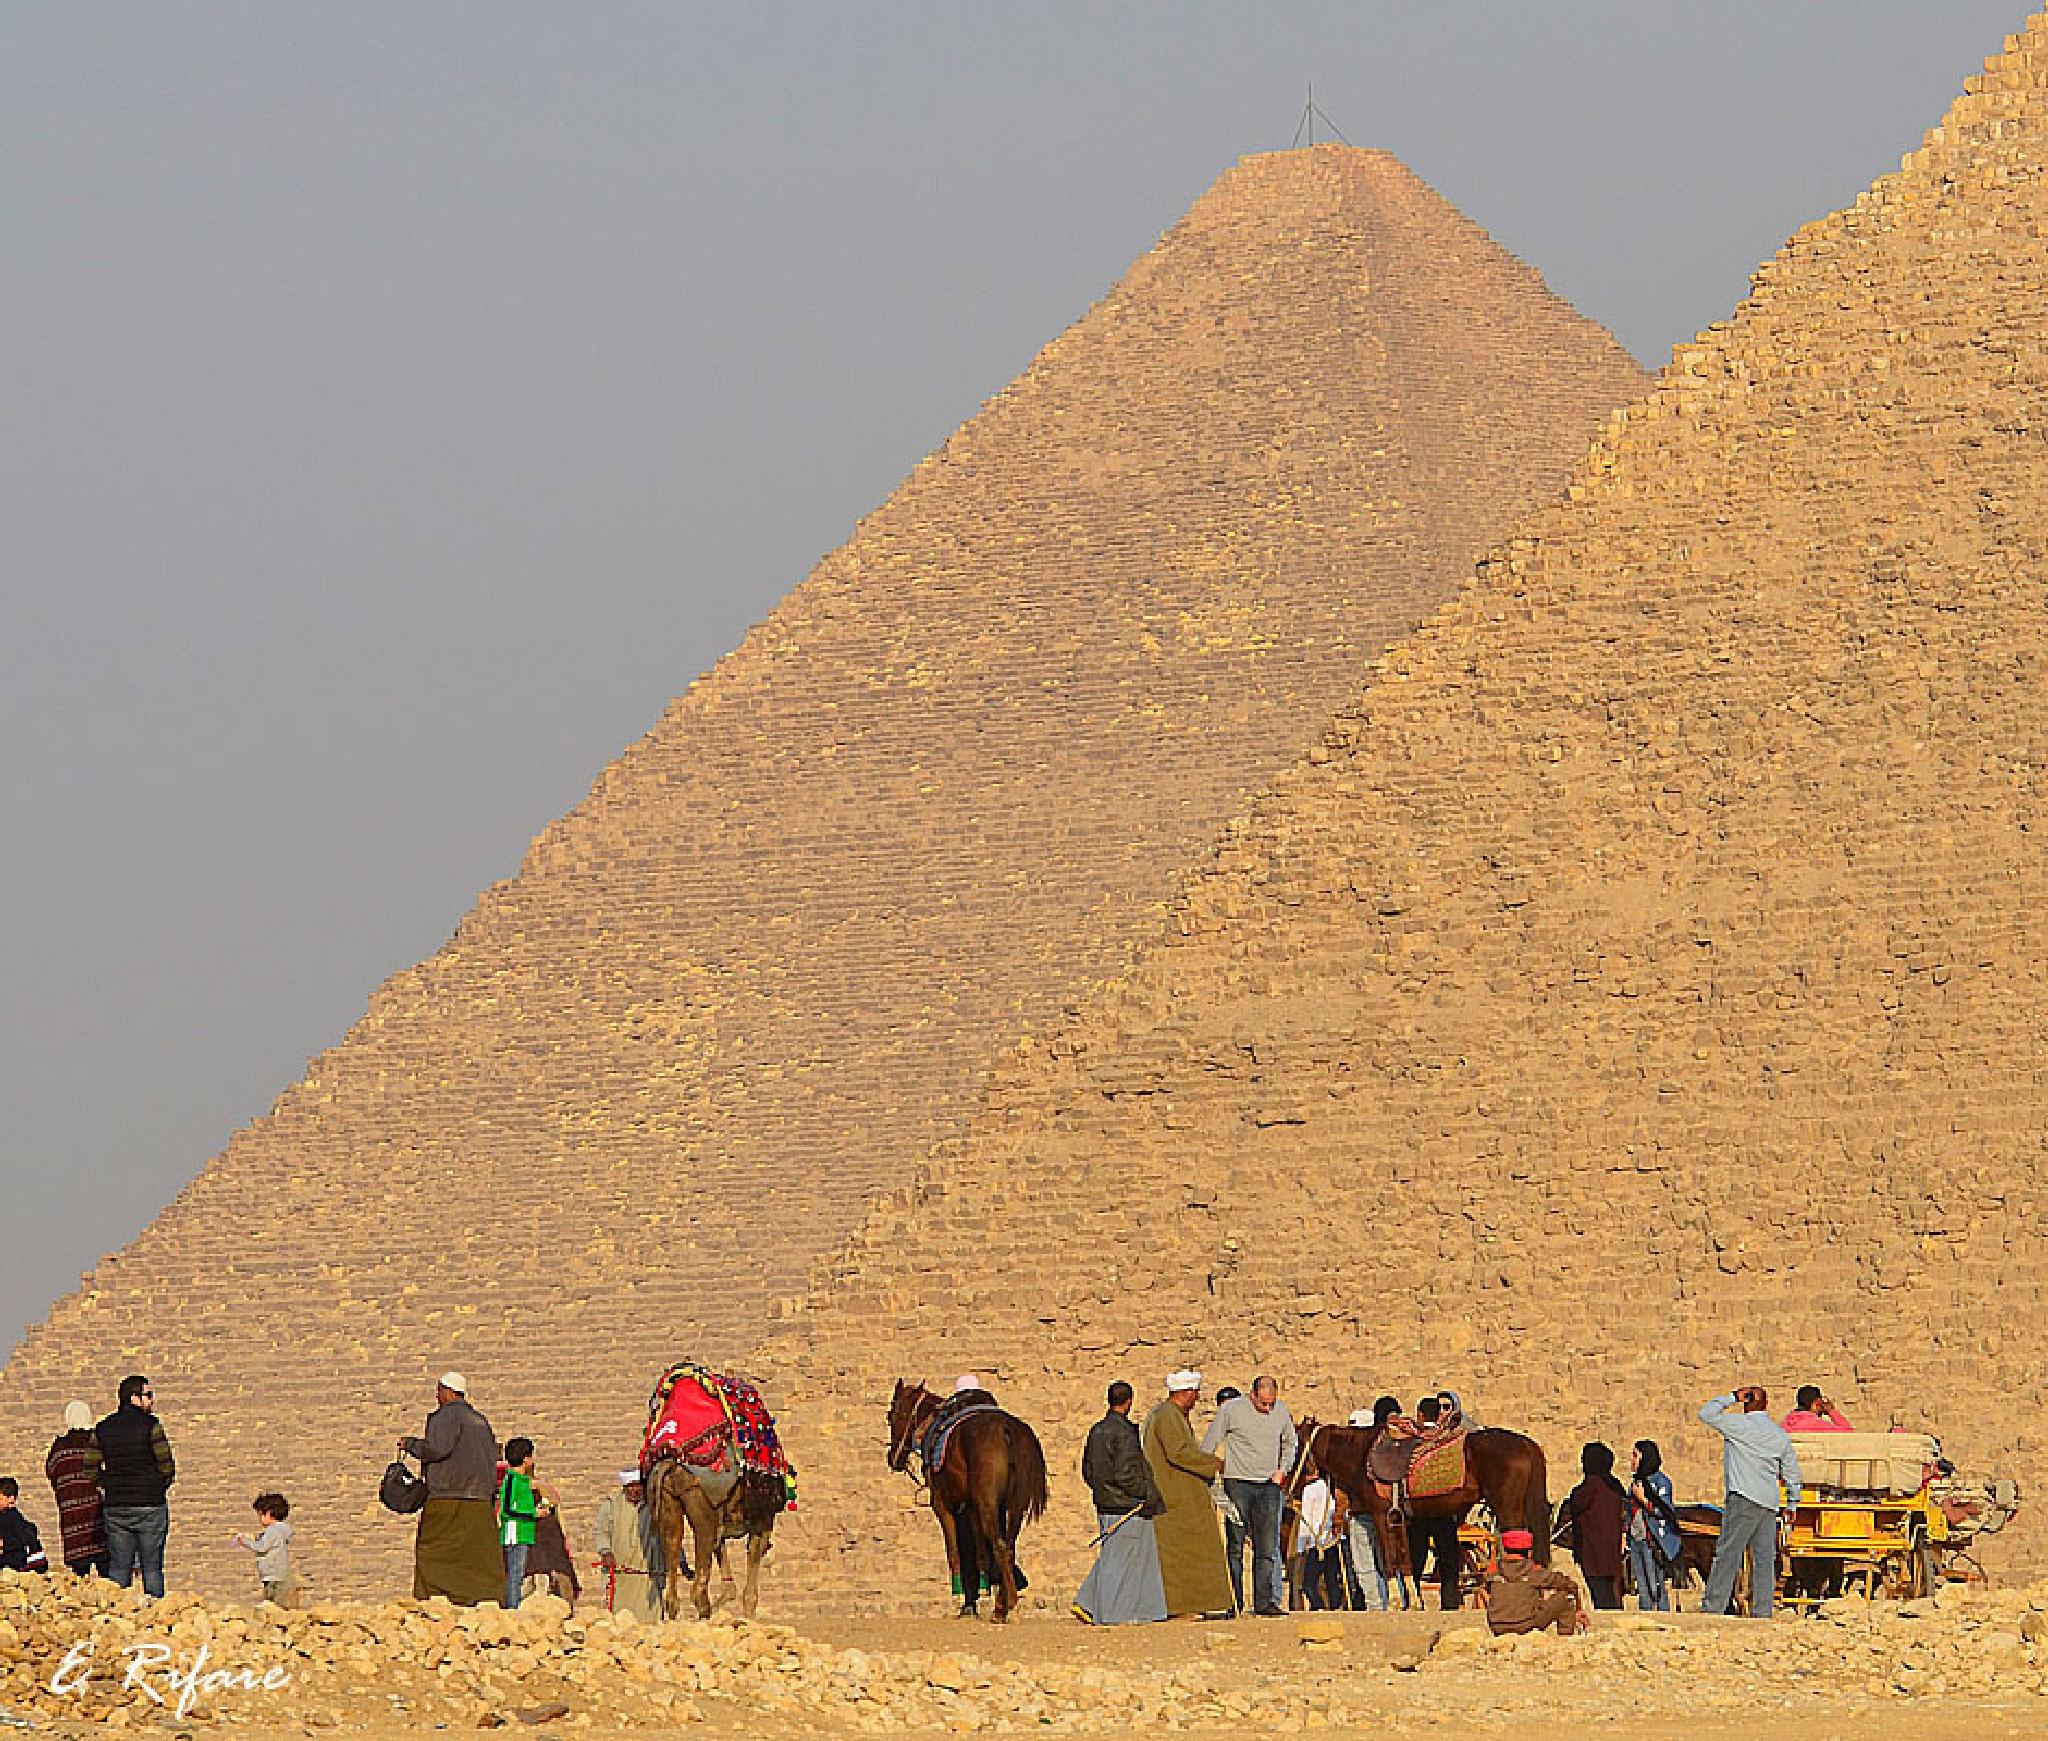 Egyptian pyramids by Emad Eldin Moustafa El Refaie